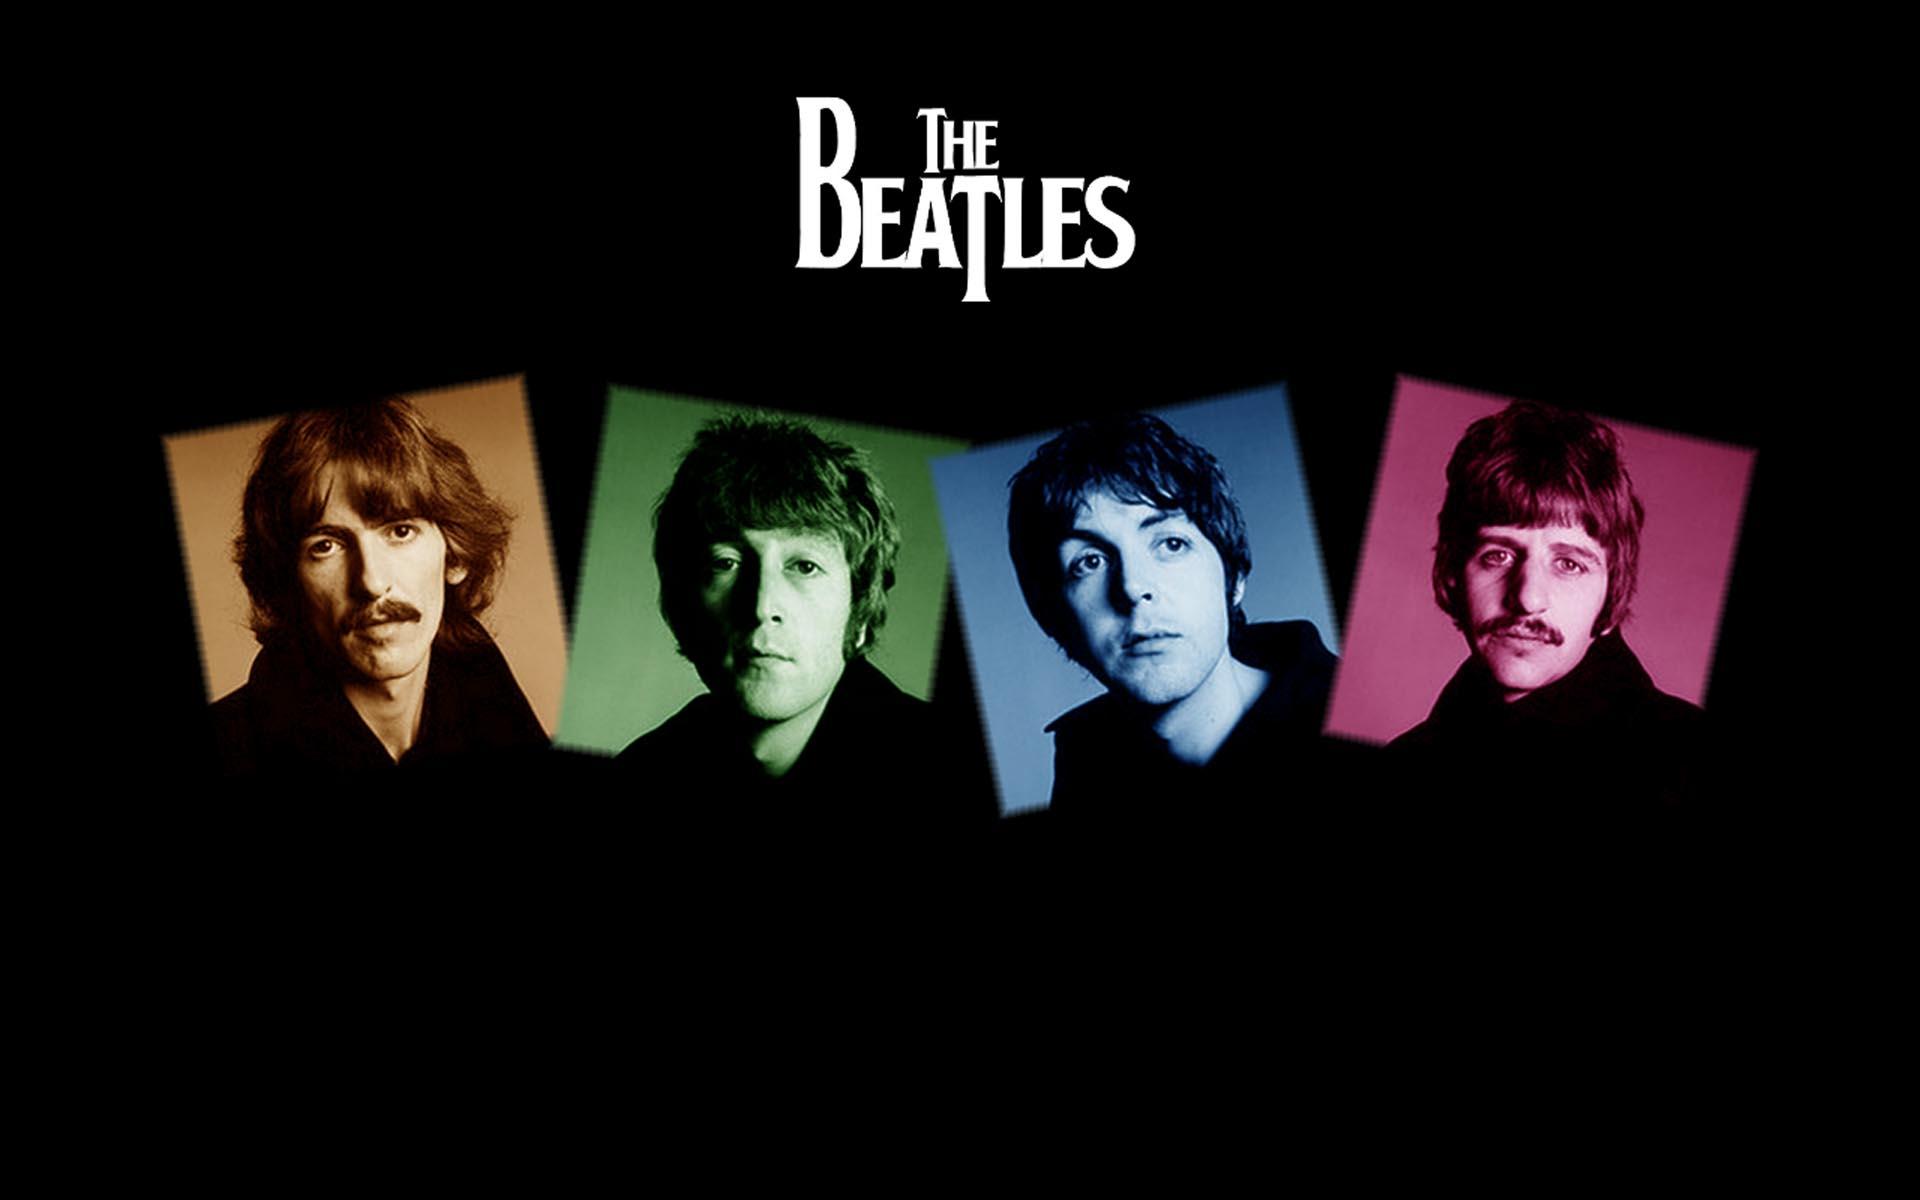 HD Beatles Wallpapers - wallpaper.wiki